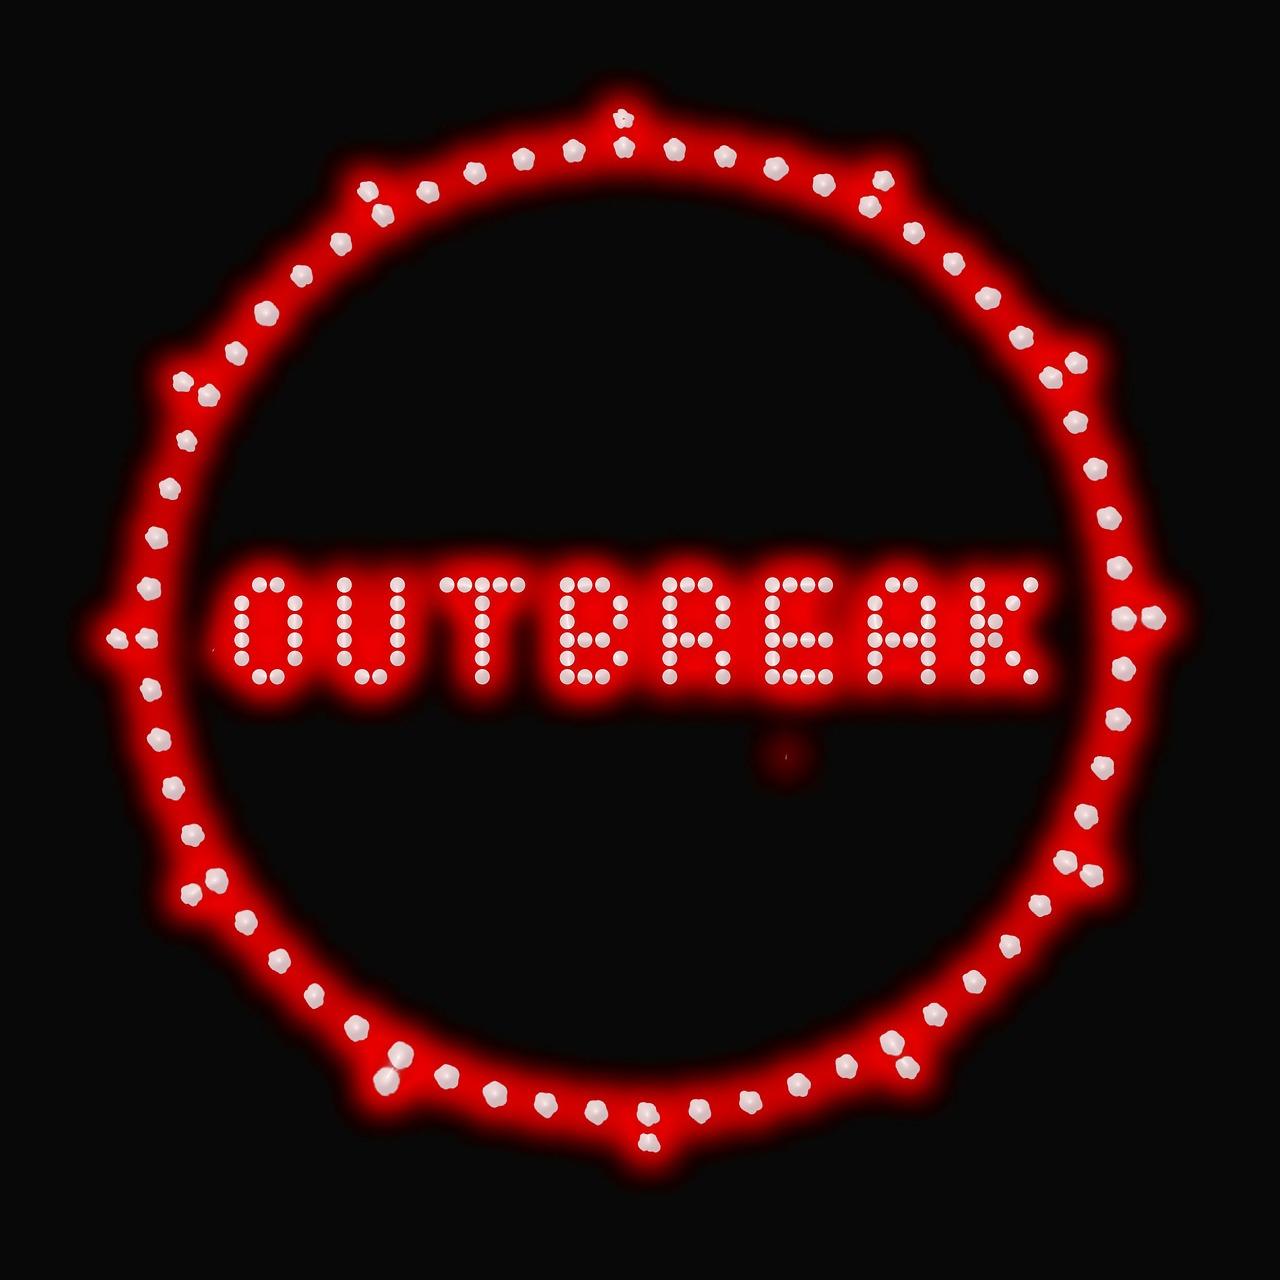 Outbreak Plague Epidemic Clock Virus District